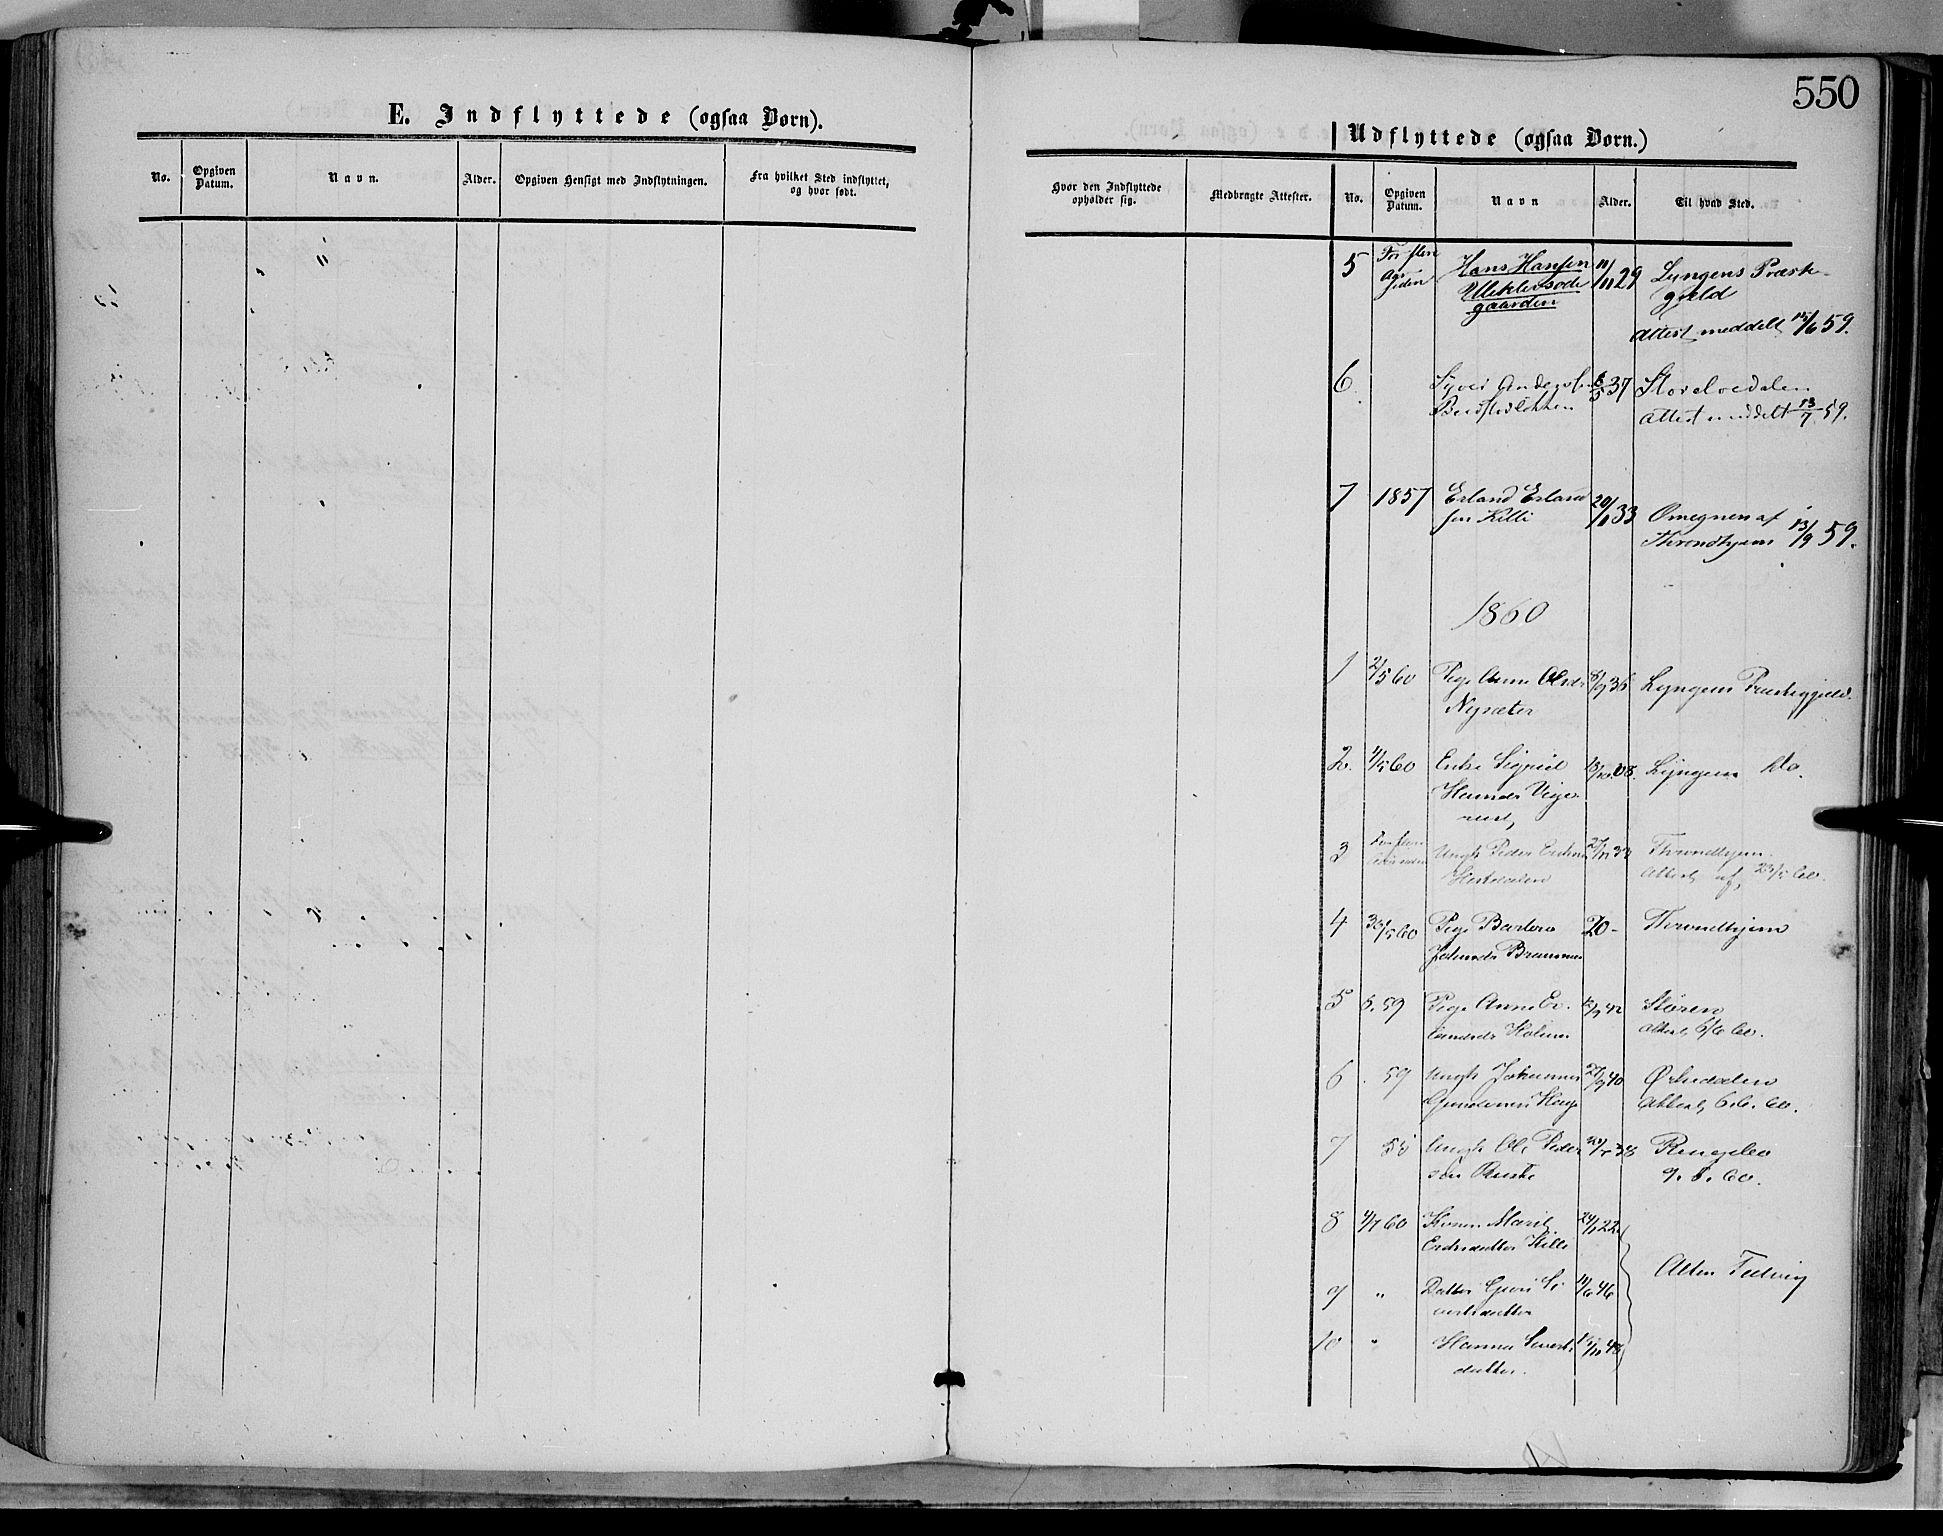 SAH, Dovre prestekontor, Ministerialbok nr. 1, 1854-1878, s. 550